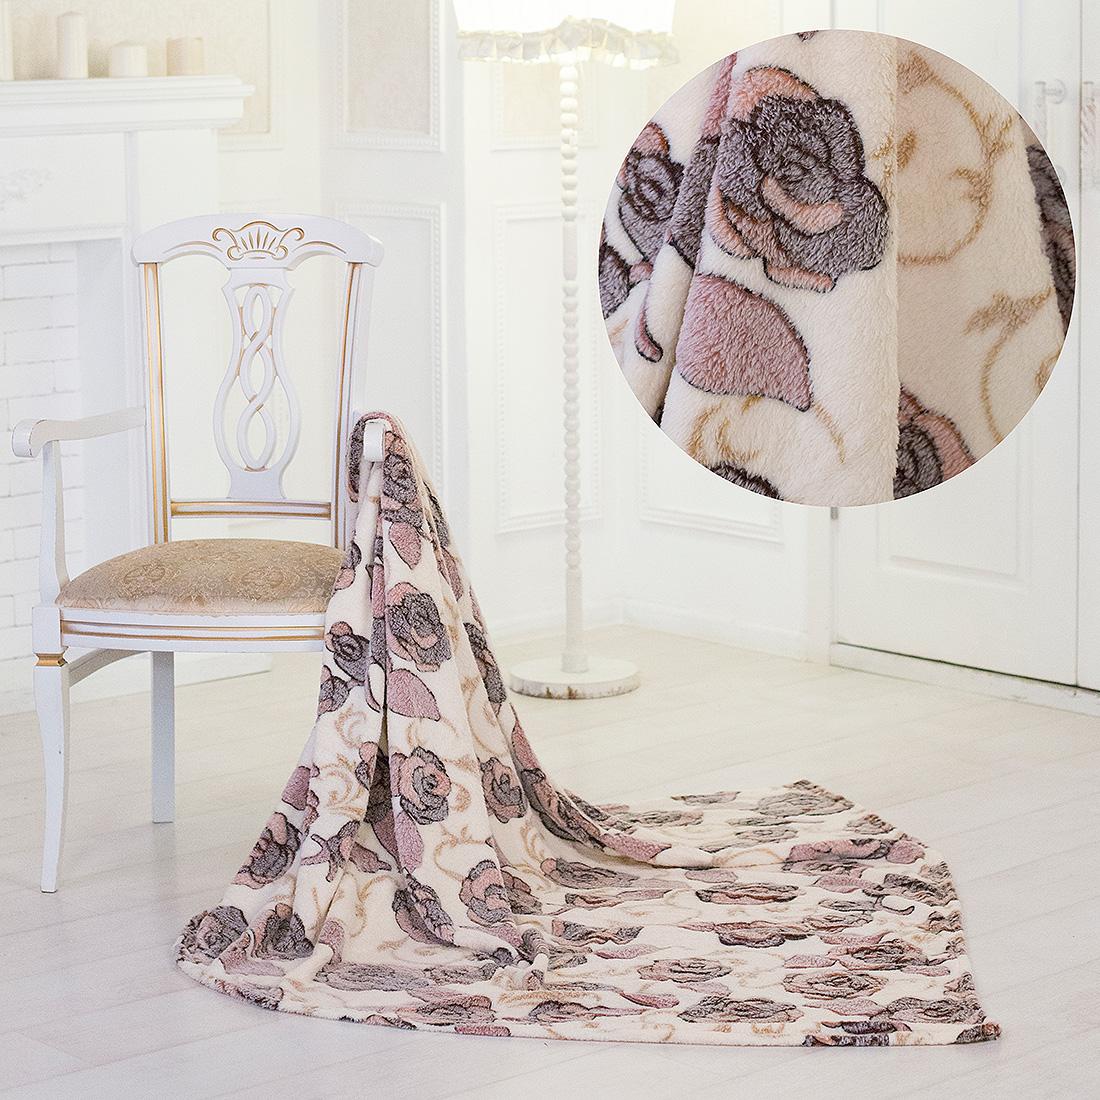 Плед Eleganta Плед Розы (150х200) плед eleganta плед помпон цвет фиолетовый 210х220 см